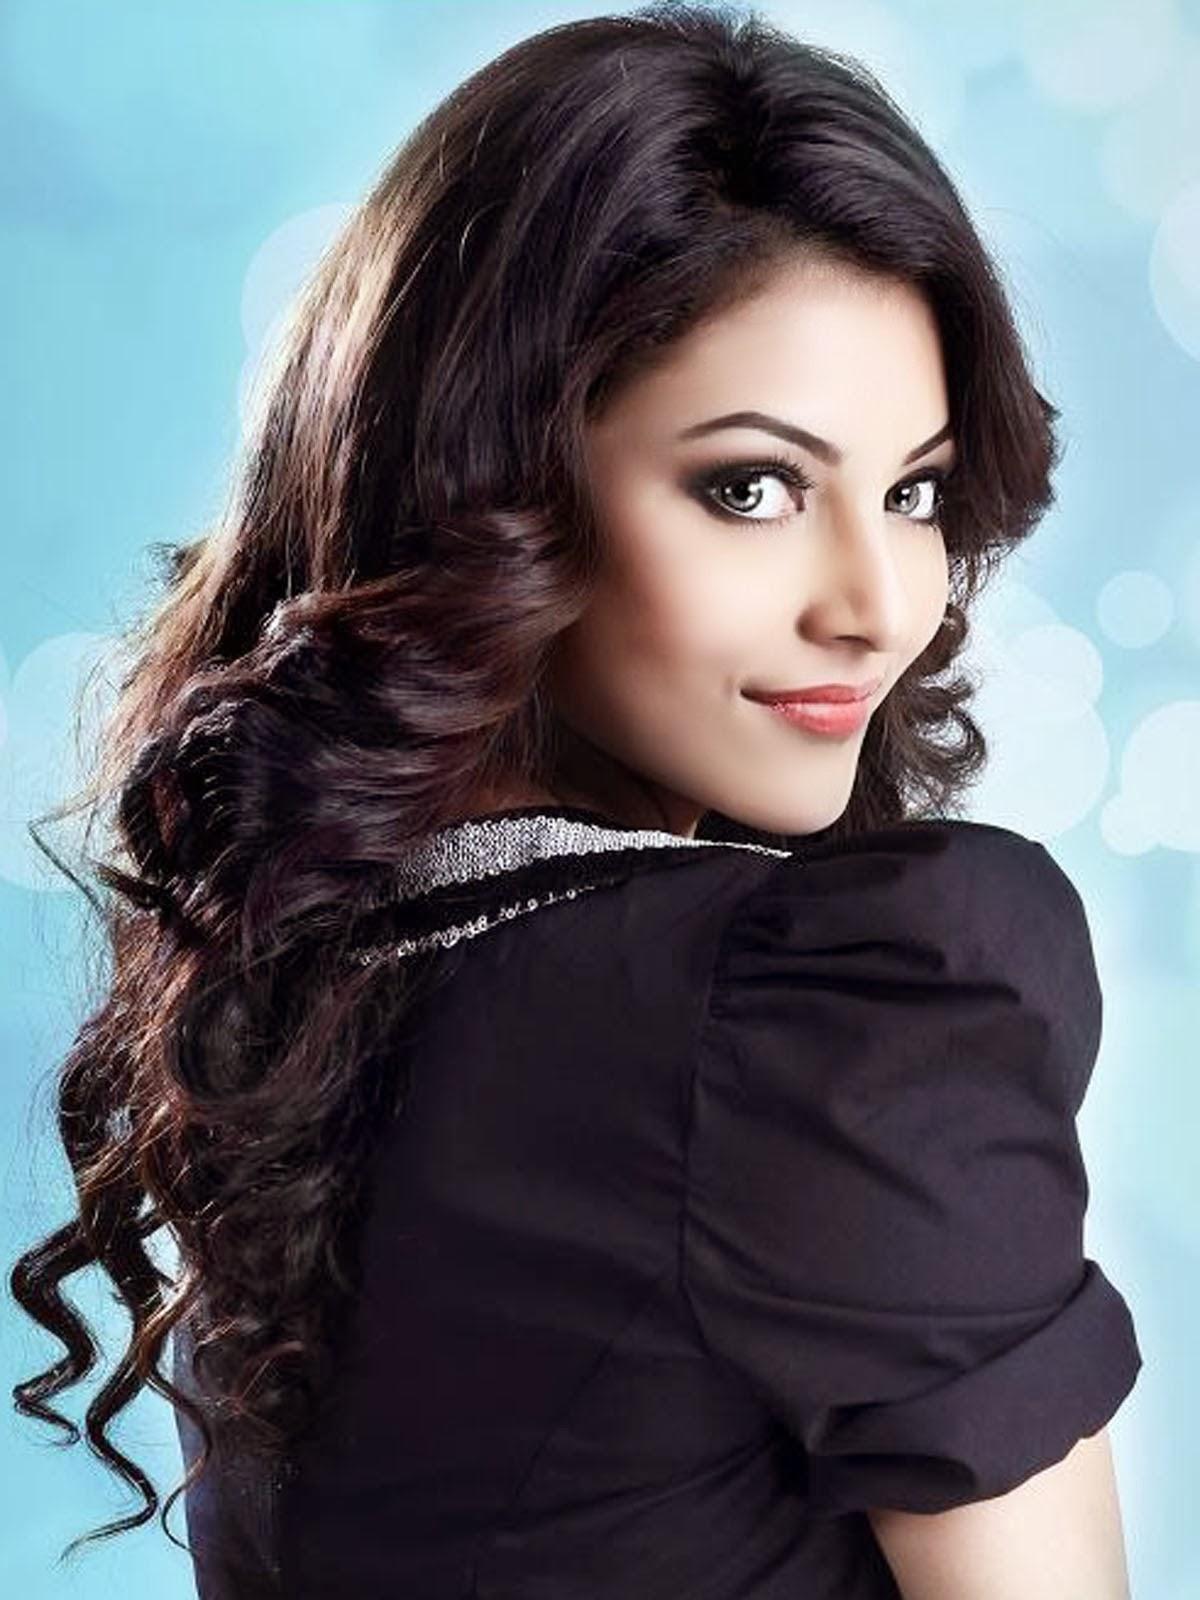 Bollywood Wallpapers: Hot And Beautful Urvashi Rautela